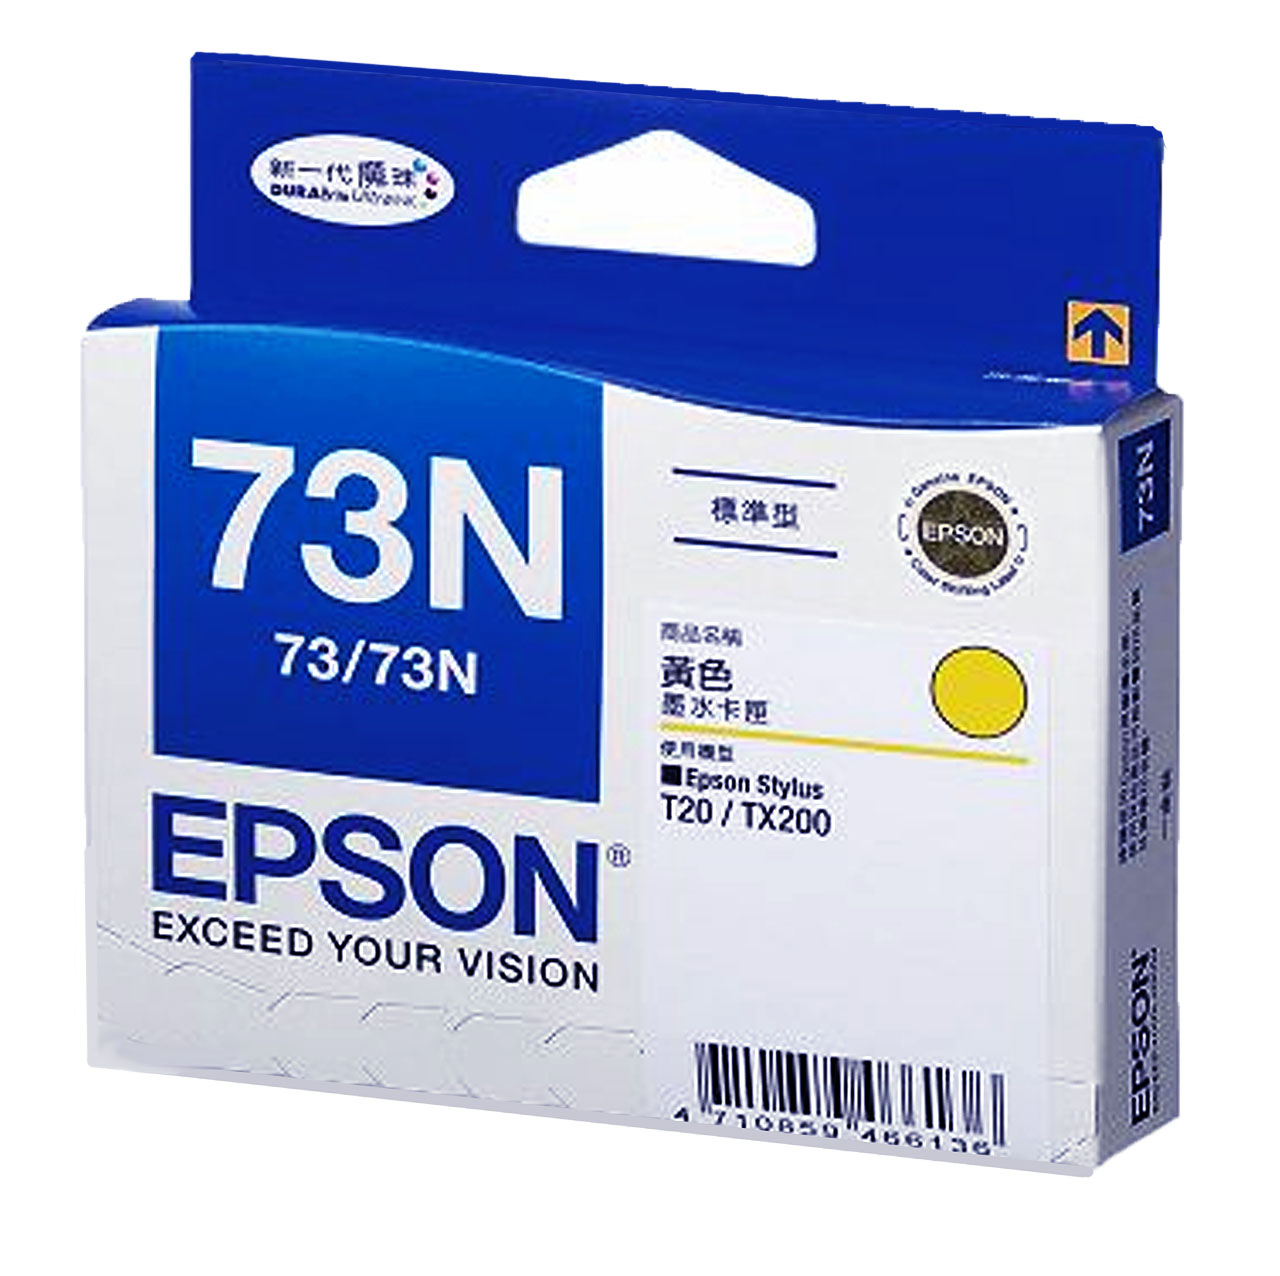 T105450 EPSON 原廠 黃色墨水匣-新一代魔珠墨水 適用 C79/C90/C110/CX3900/CX4900/CX5500/CX5505/CX5900/CX6900F